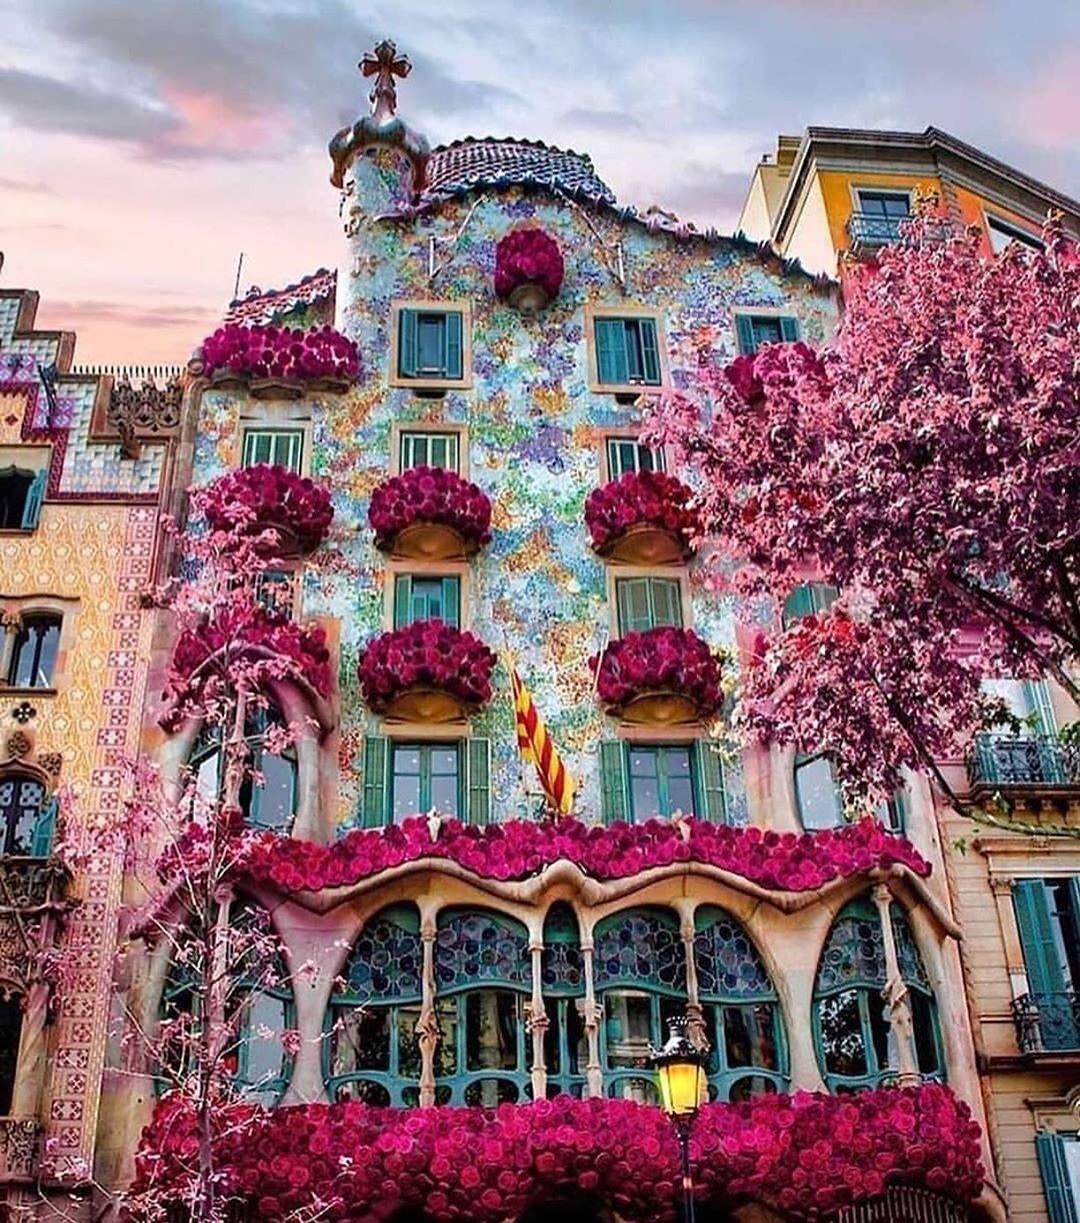 European Travel Travel Mugs Lets Travel The World Ideas Travel Hawaii Travel Whole30 Travel Travel Gadgets Travel Mug Diy Tra Gaudi Barcelona Casa Batlló Gaudi